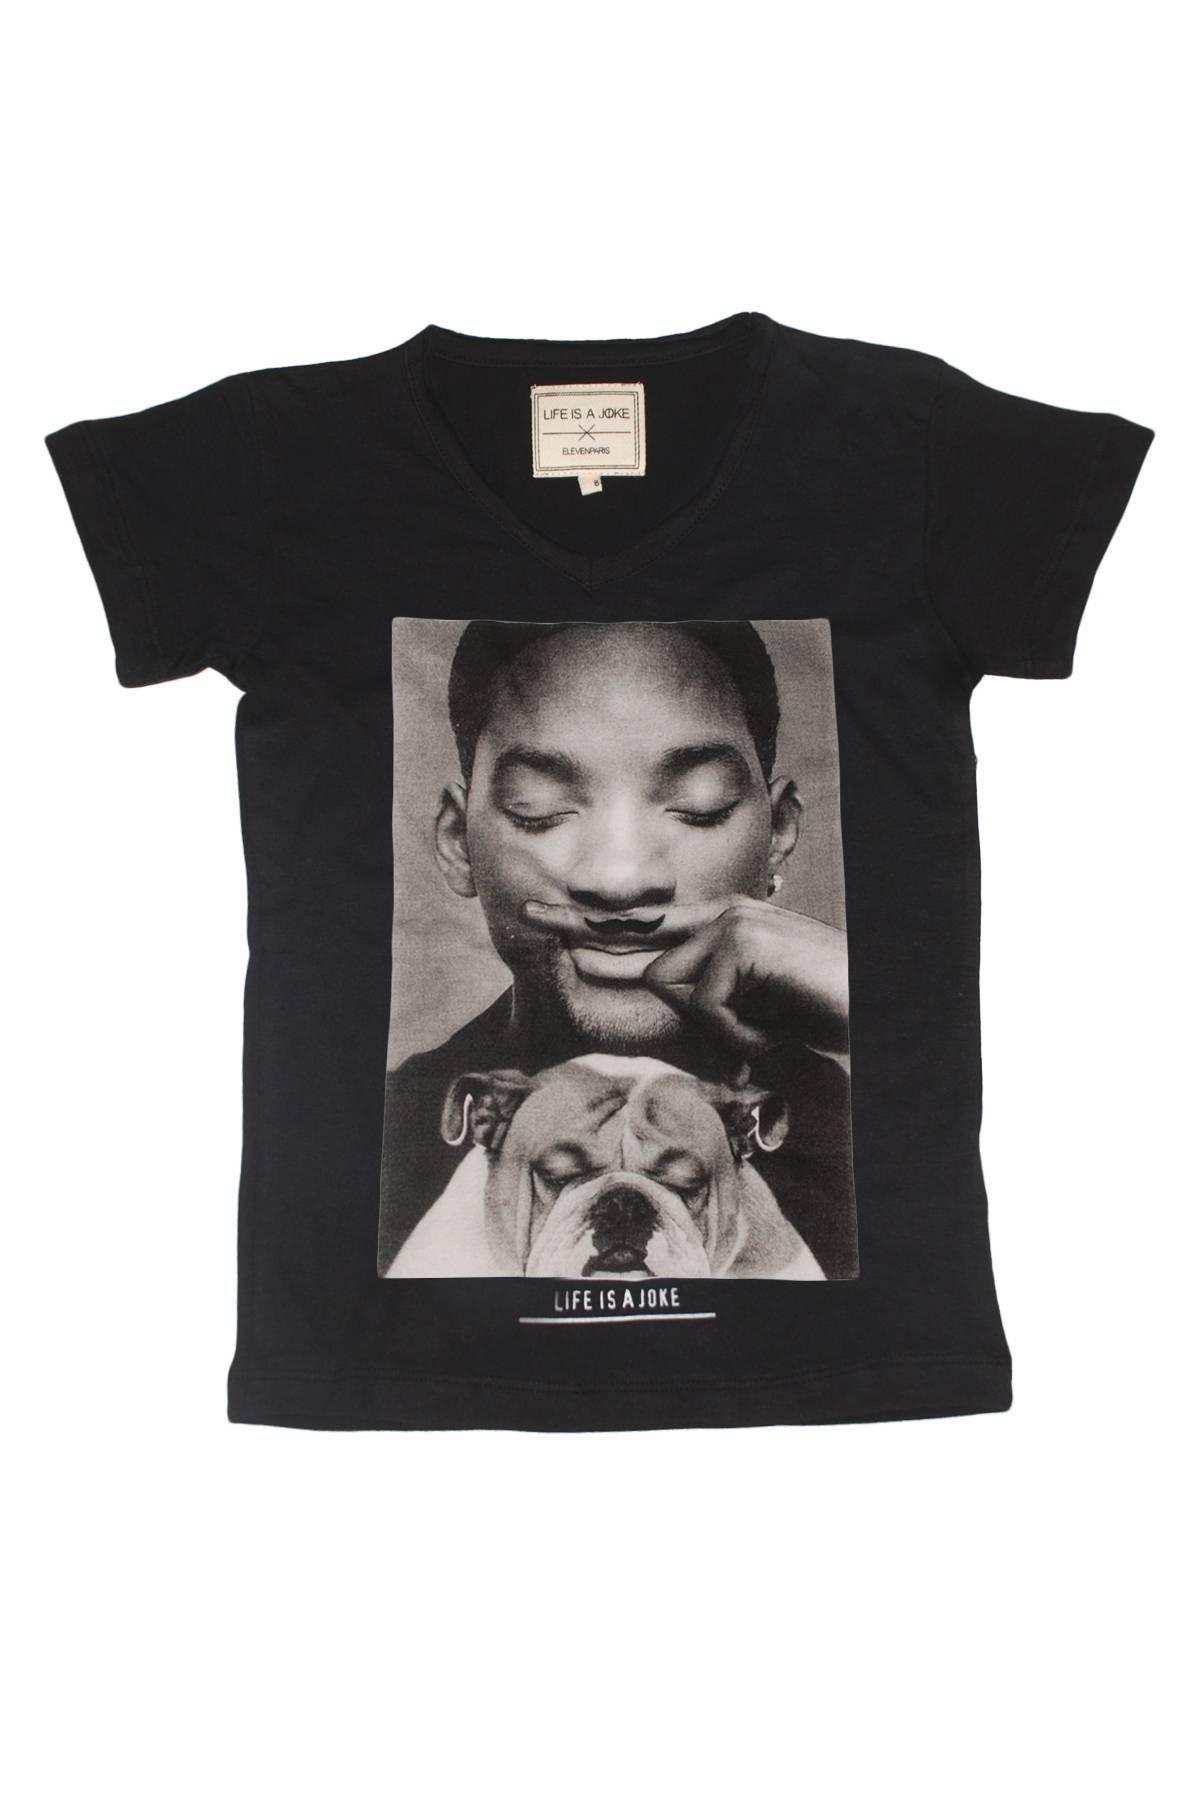 ELEVEN PARIS - little will - t-shirt will